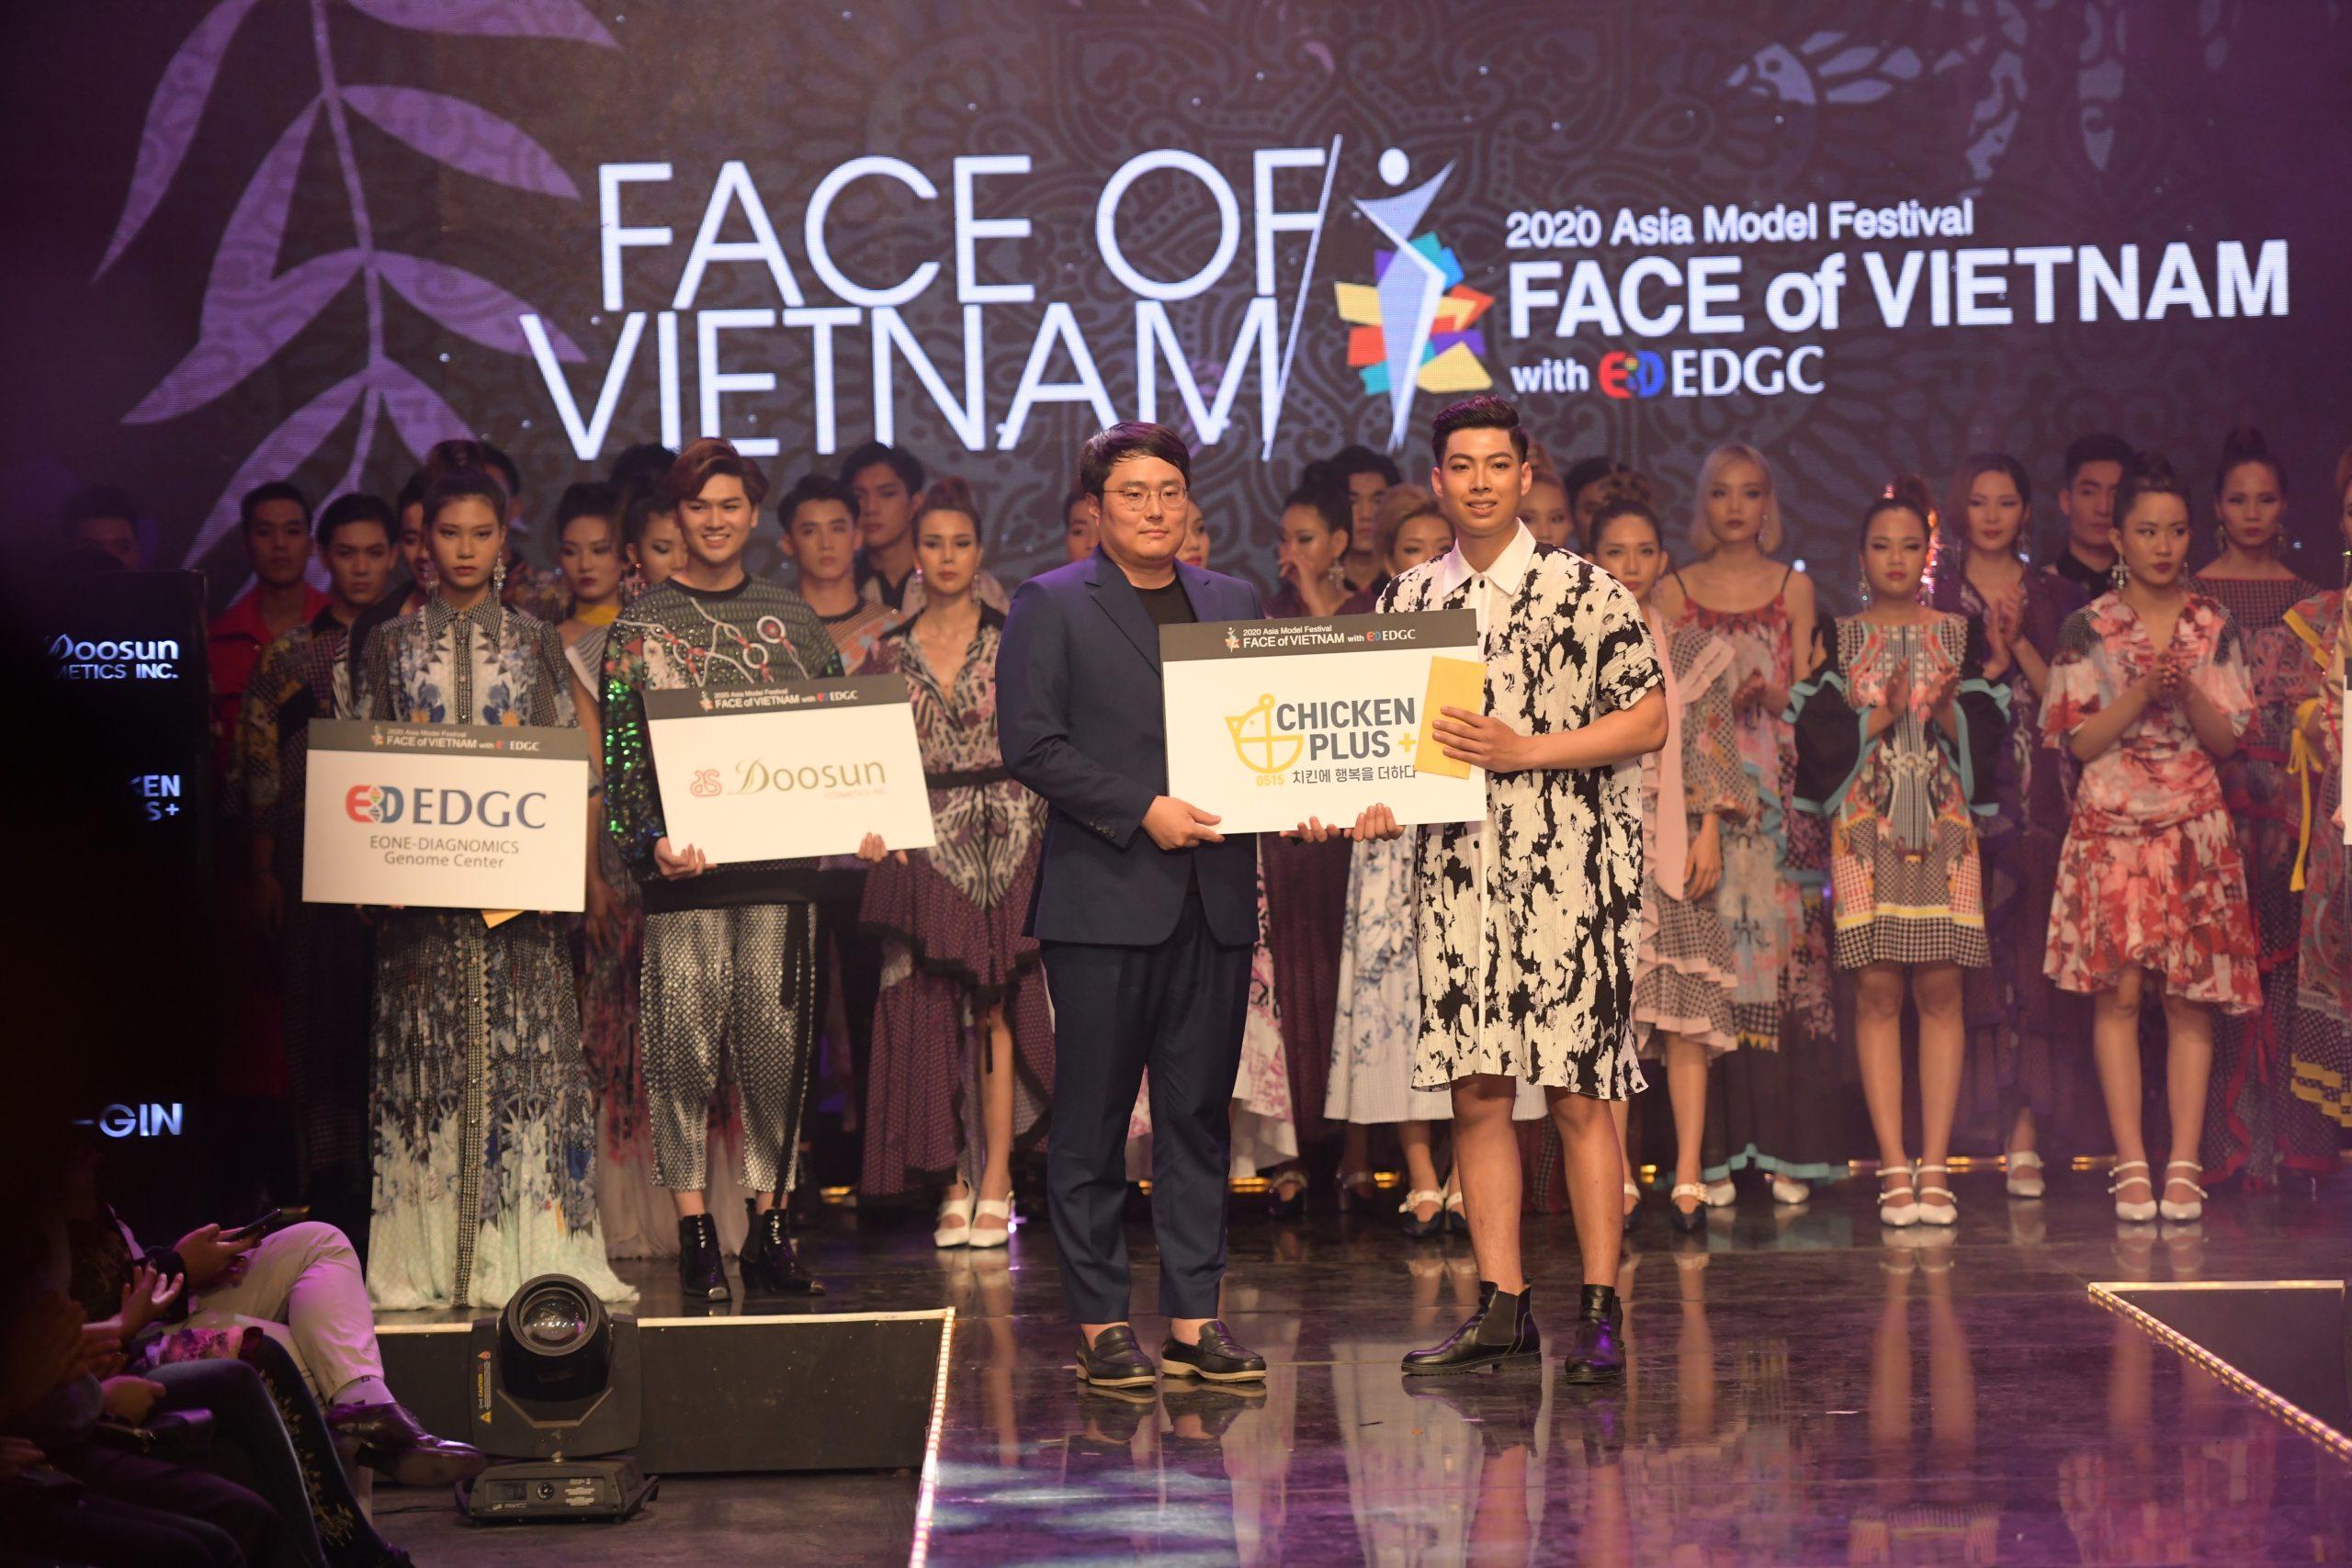 CHICKEN PLUS muốn tiếp cận Việt Nam qua Face Of Việt Nam